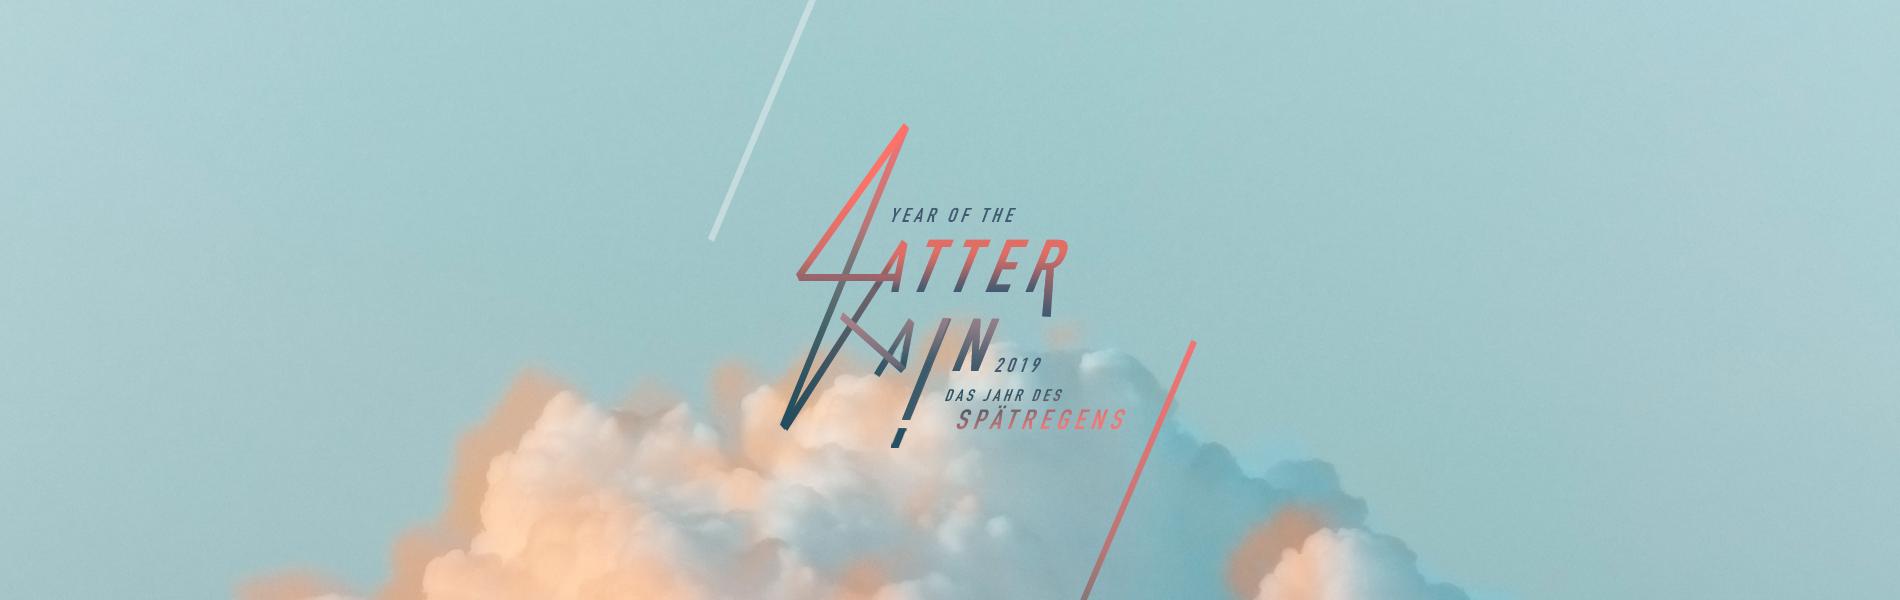 2019_02_Feb_Year_of_the_Latter_Rain_DE Home | New Creation TV